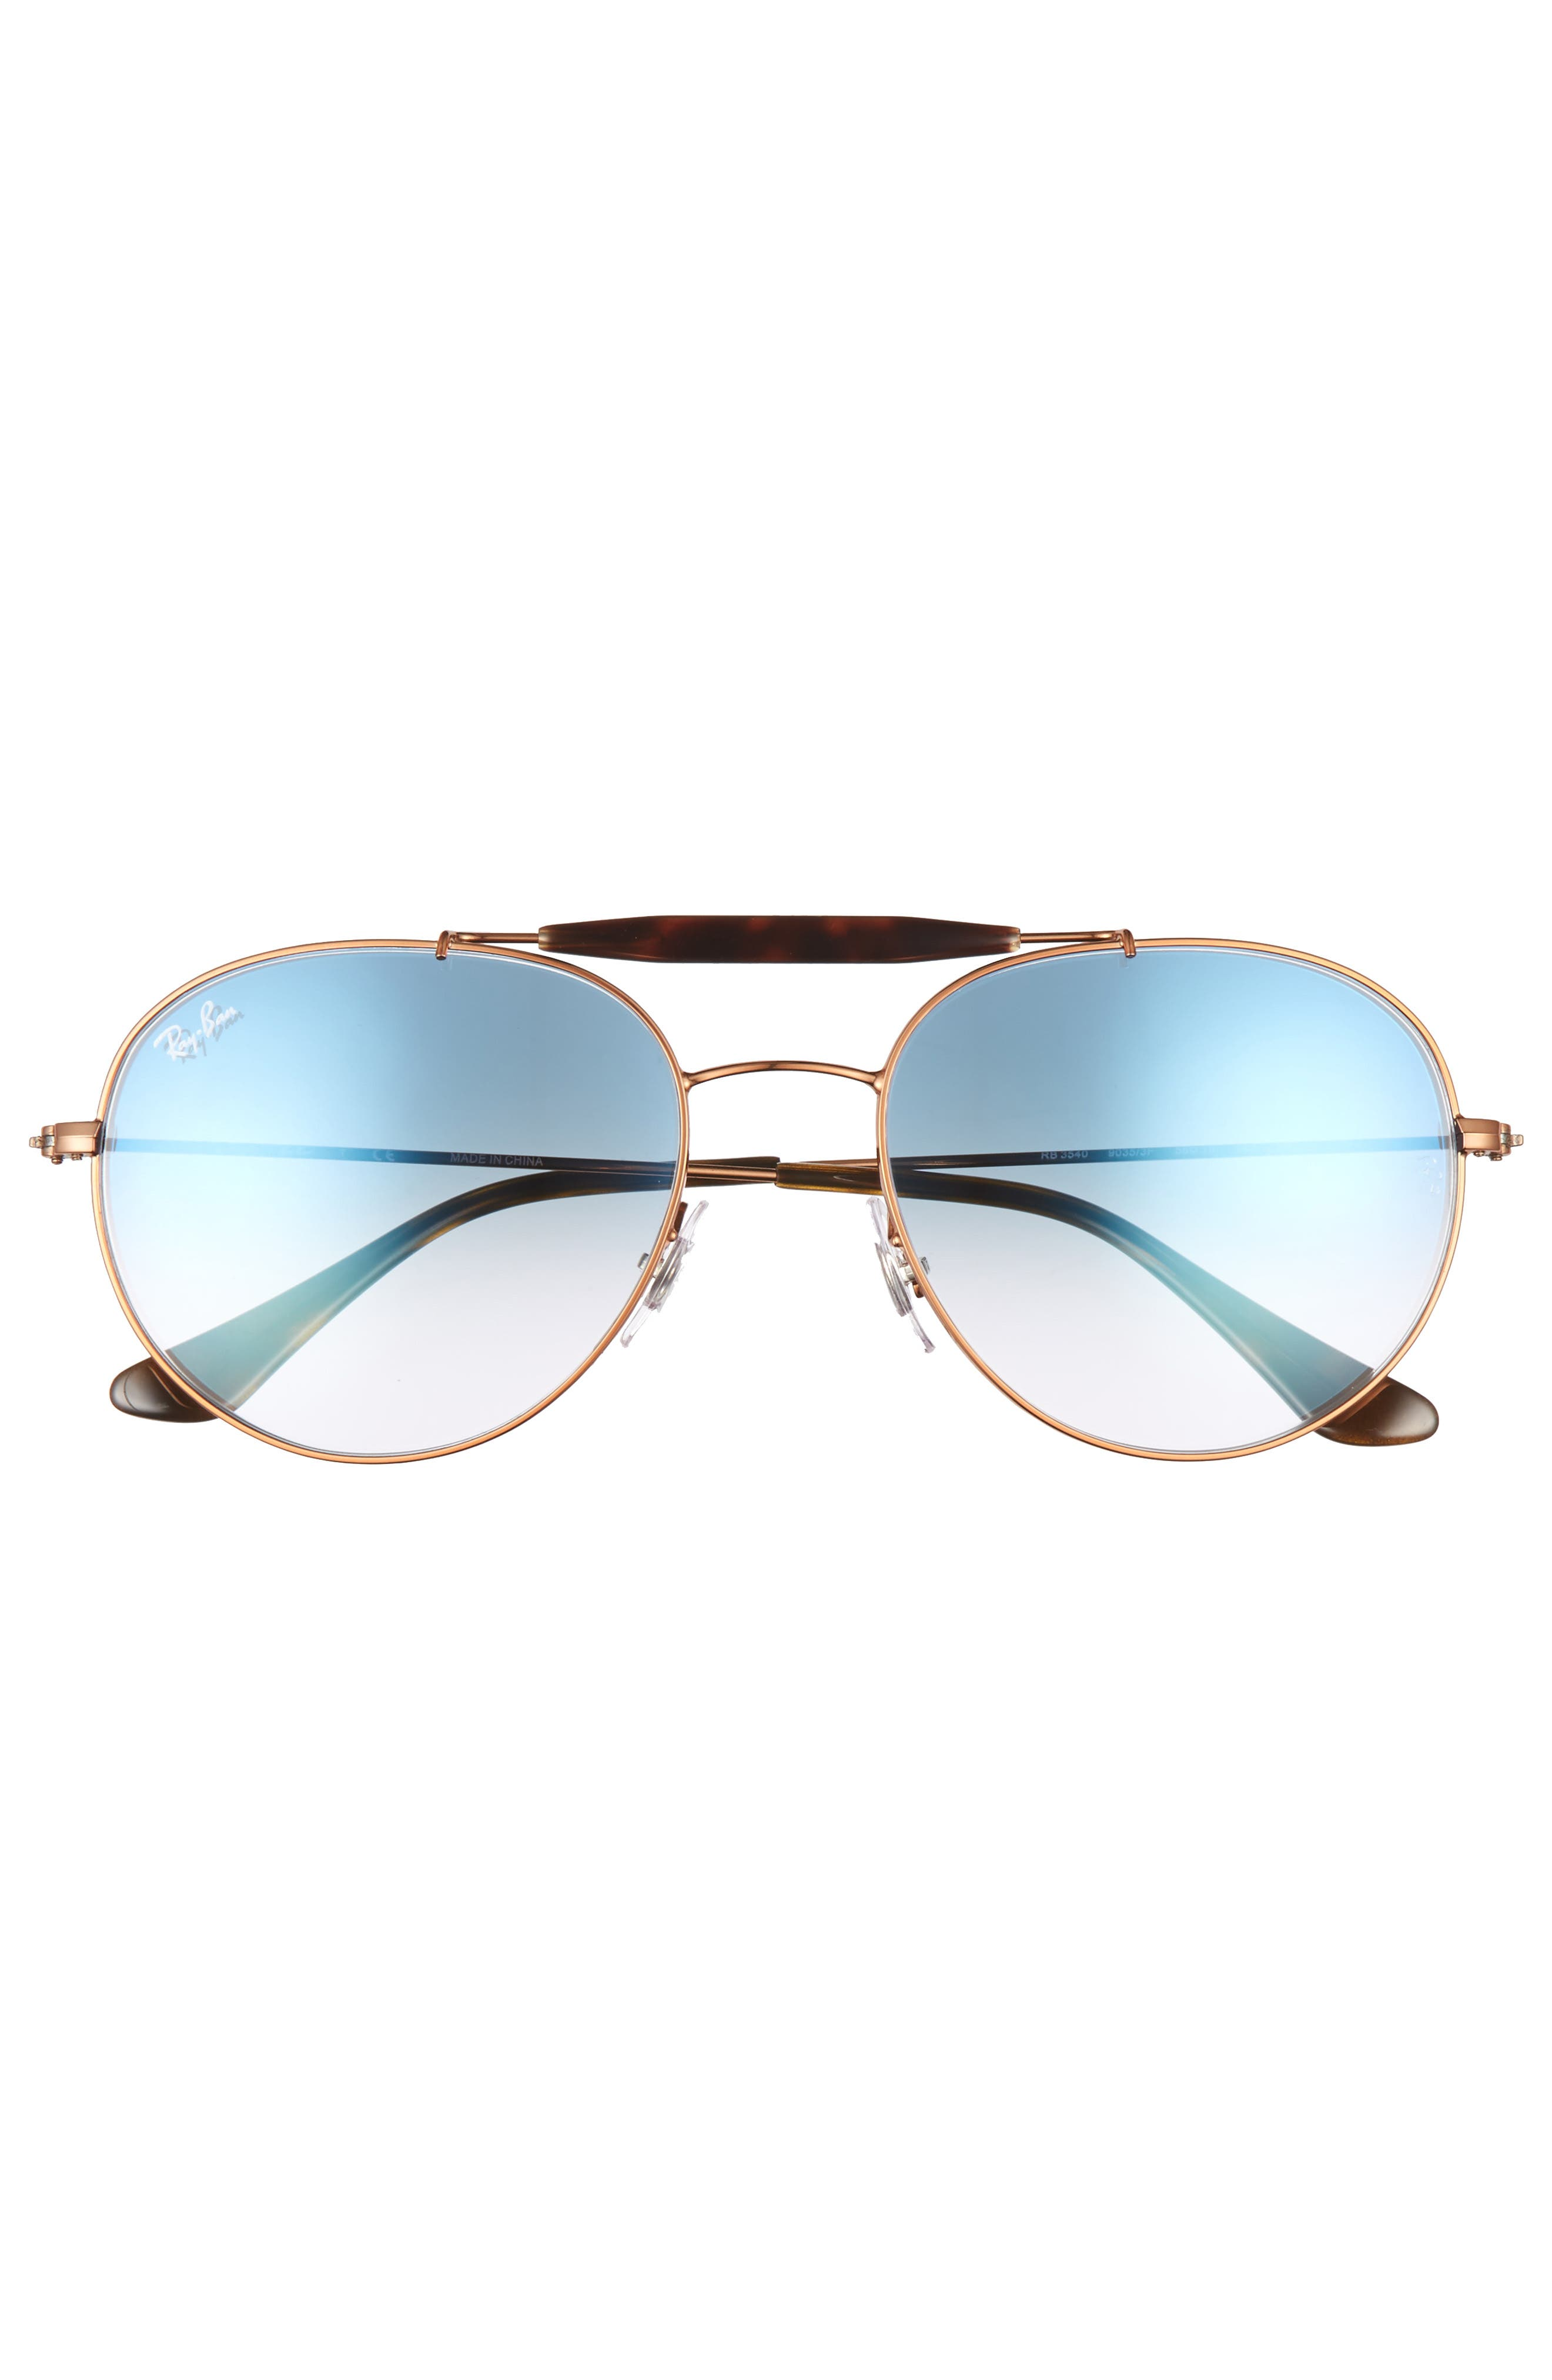 Highstreet 56mm Sunglasses,                             Alternate thumbnail 3, color,                             220